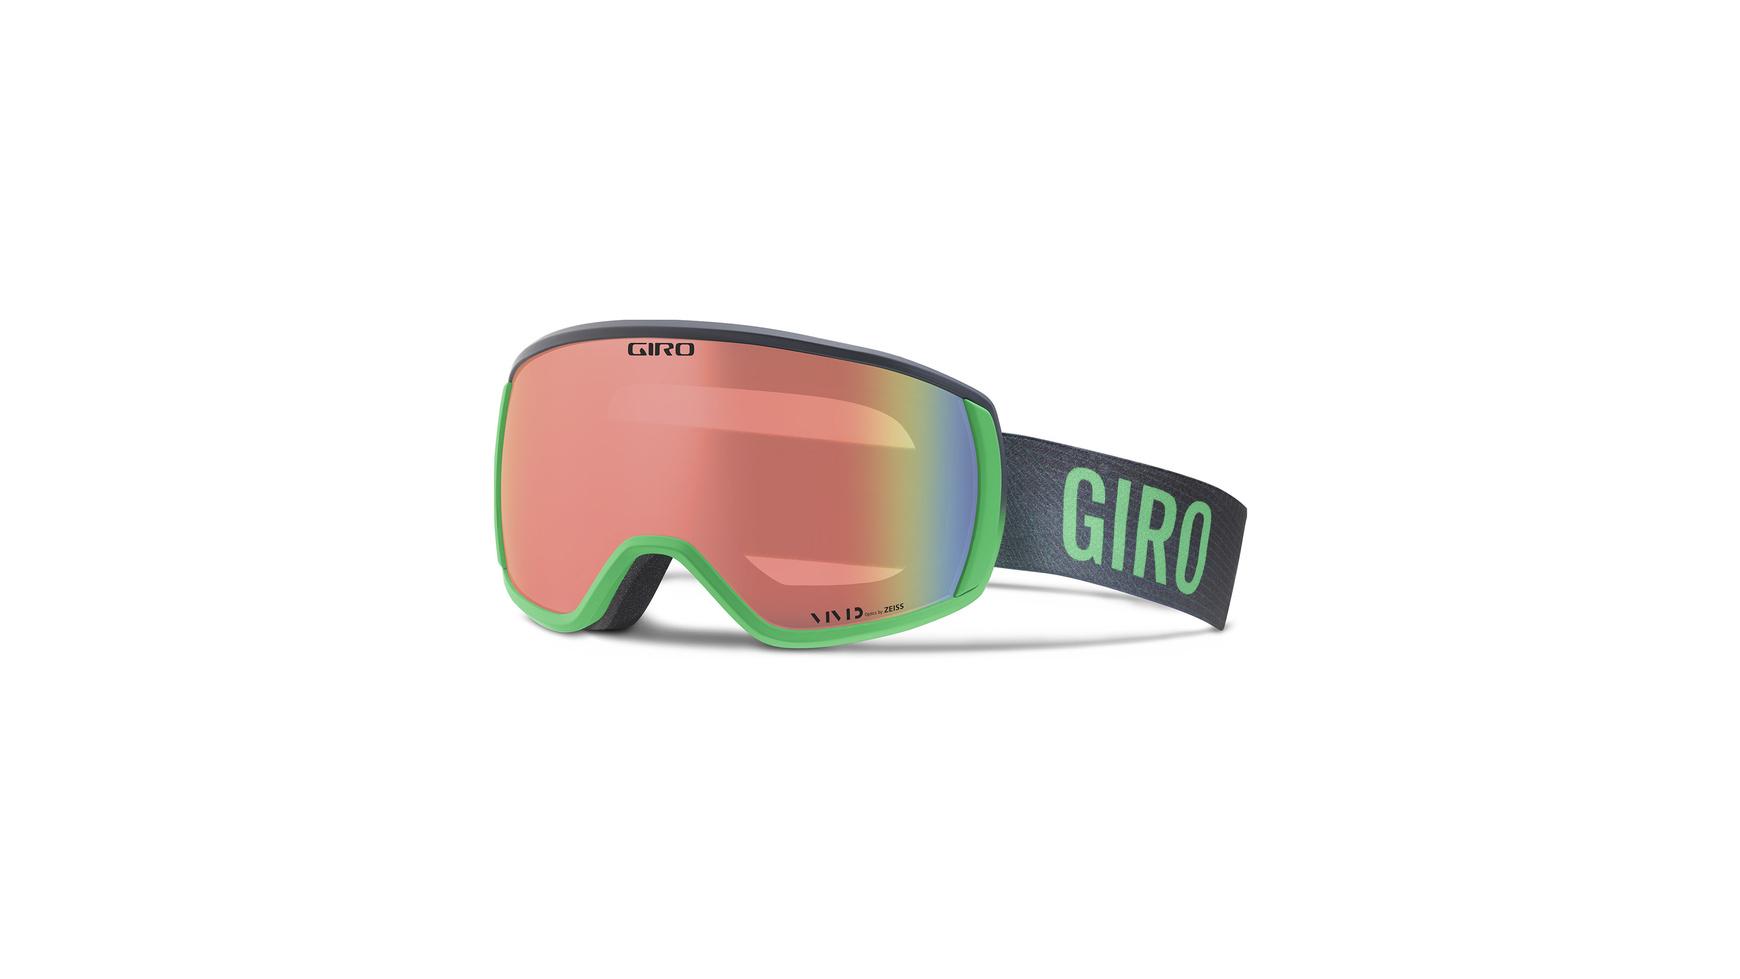 300057009_giro_g_balance_brightgreenturbulencefaded_vividinfrared_main